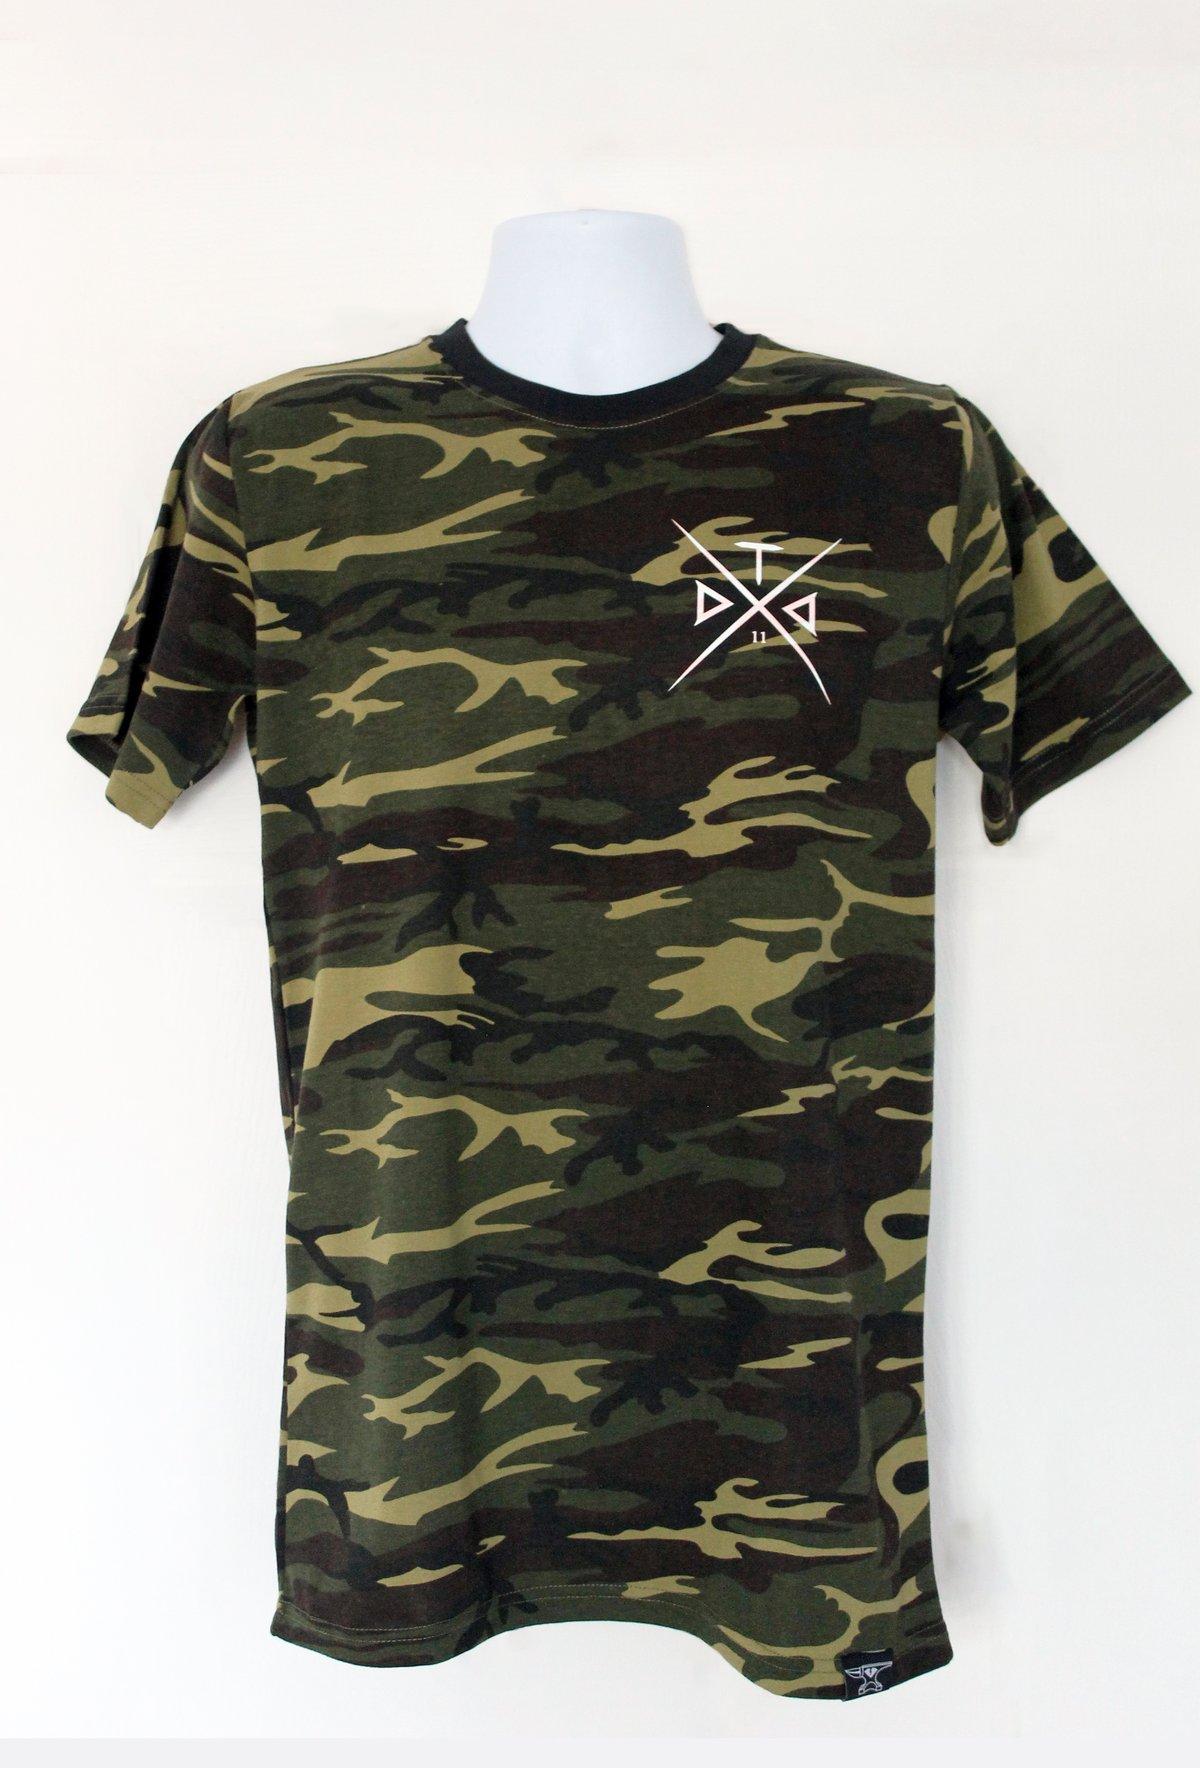 Camo Cross Tshirt